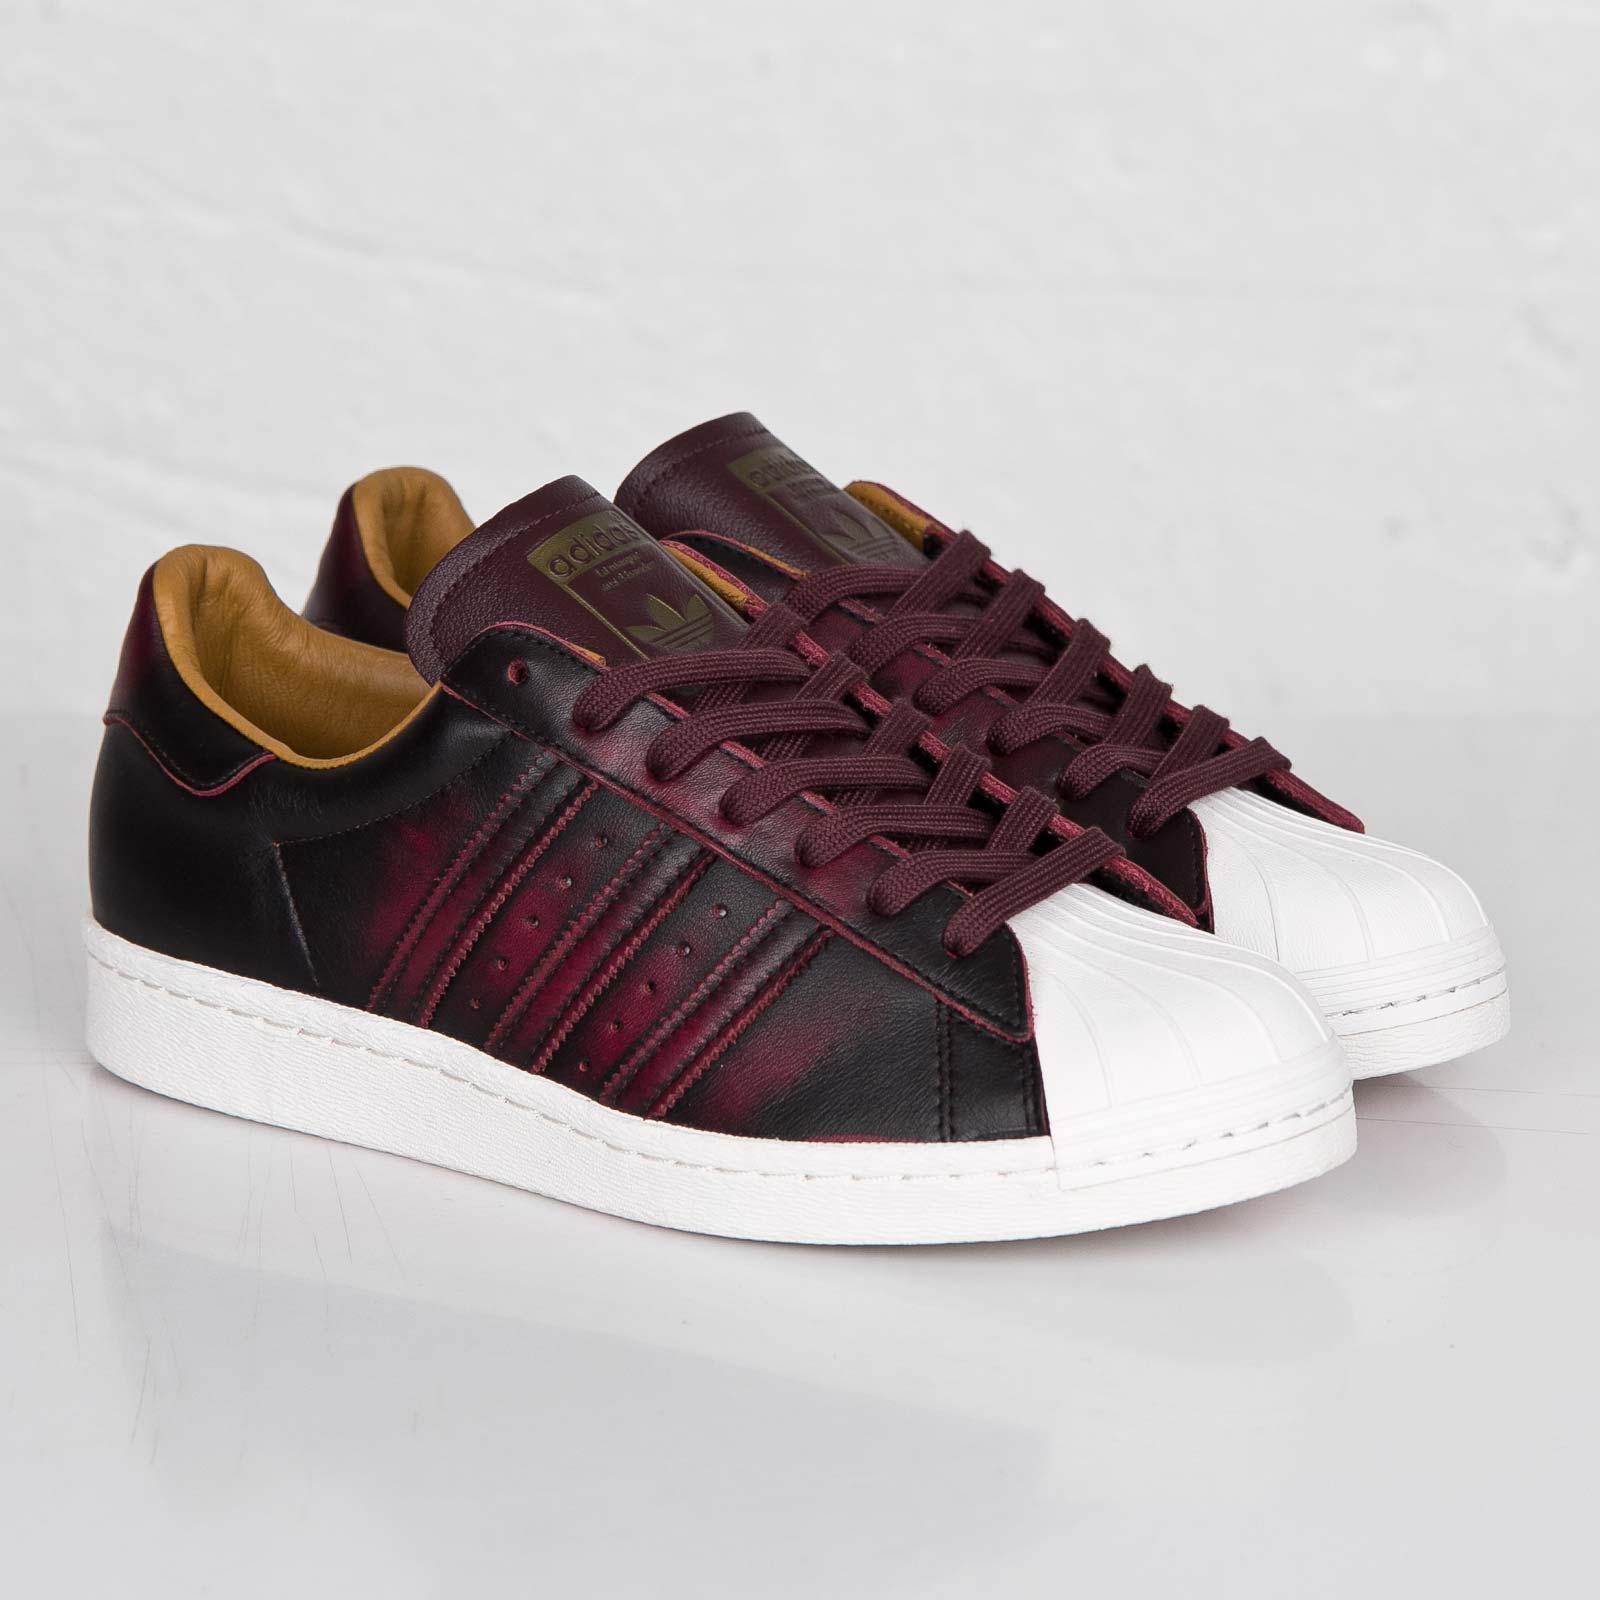 adidas Superstar 80s - M20922 - Sneakersnstuff